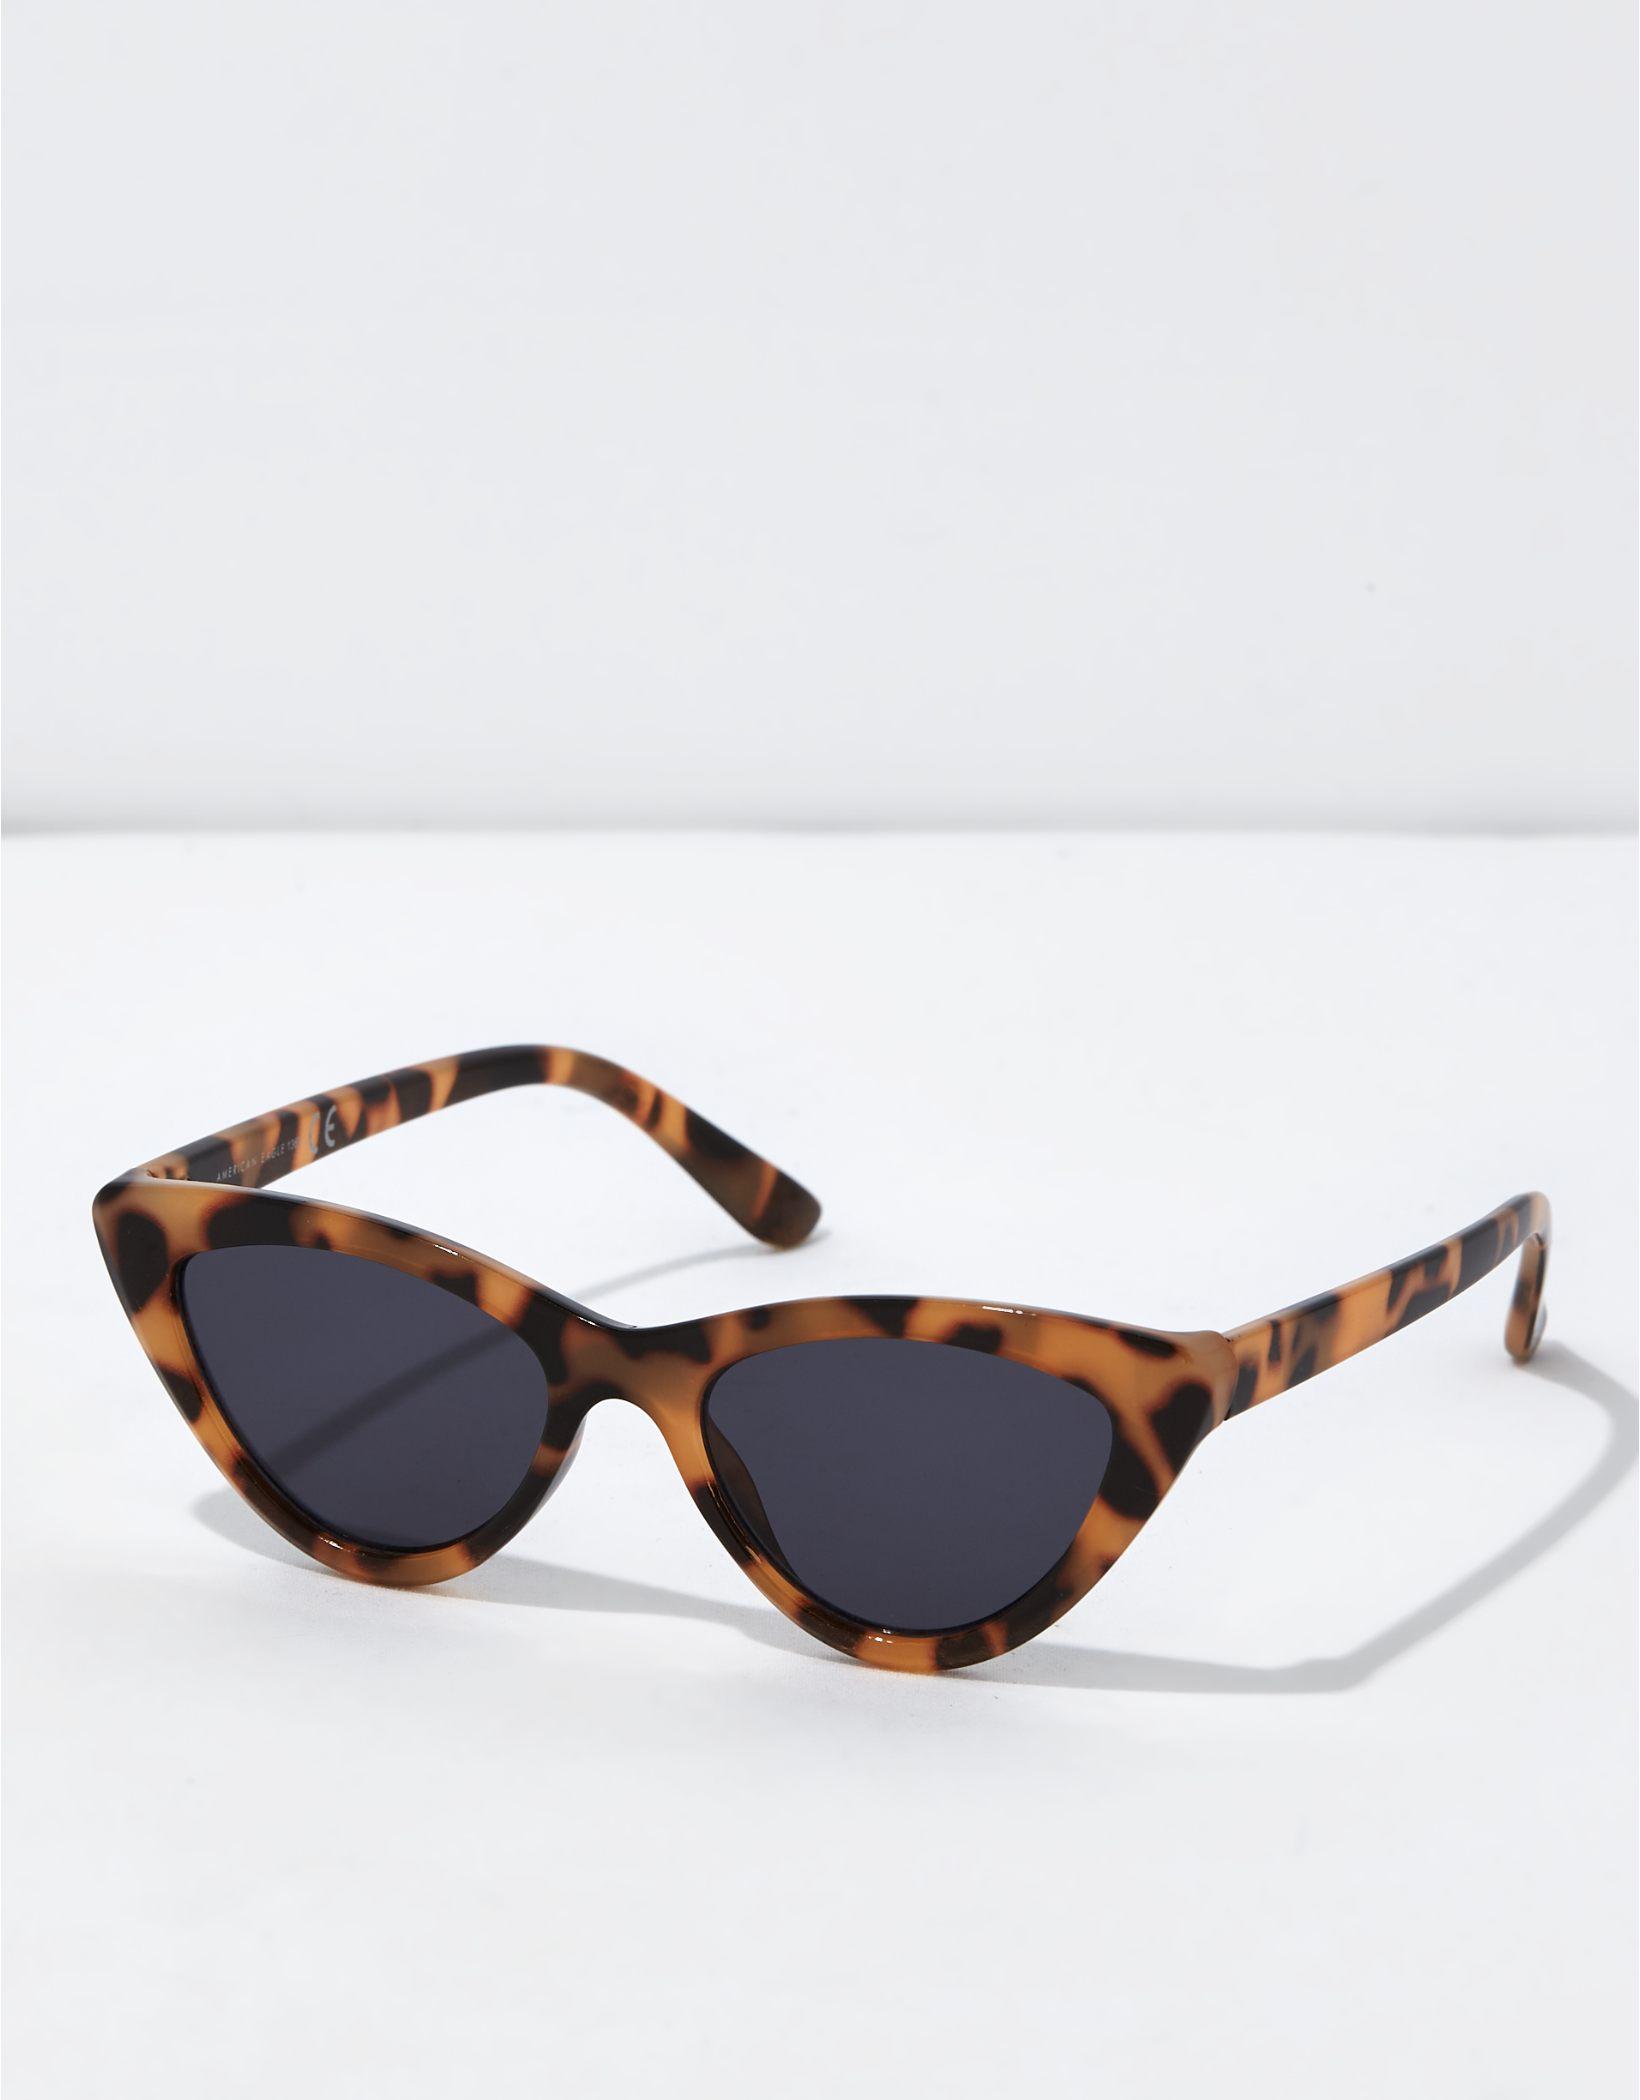 AE Tortoise Cat Eye Sunglasses